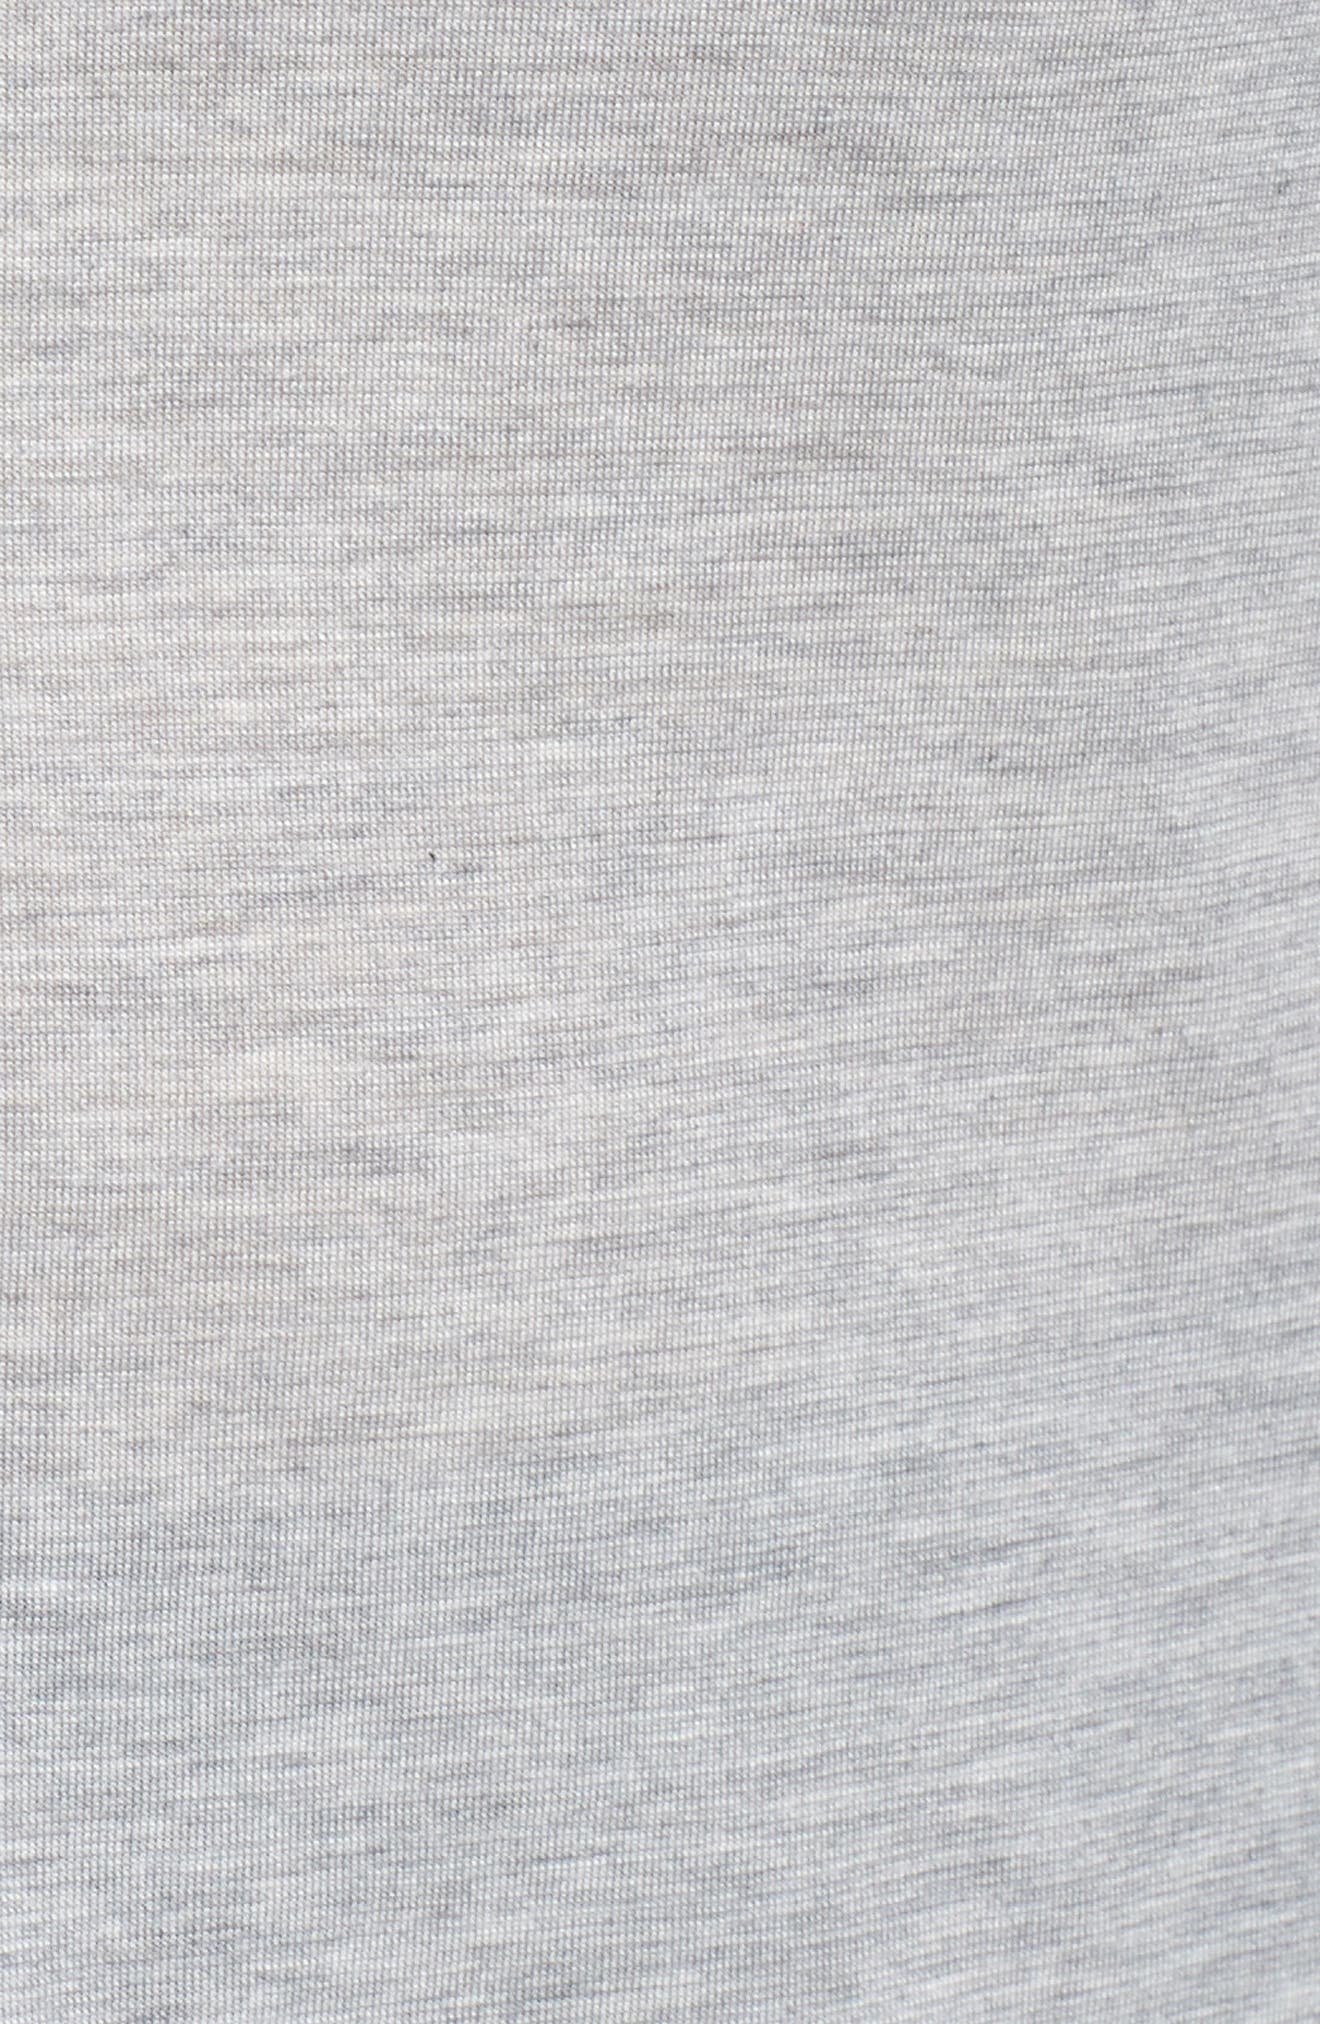 Long Sleeve Ruffle Shoulder Top,                             Alternate thumbnail 5, color,                             Light Heather Grey